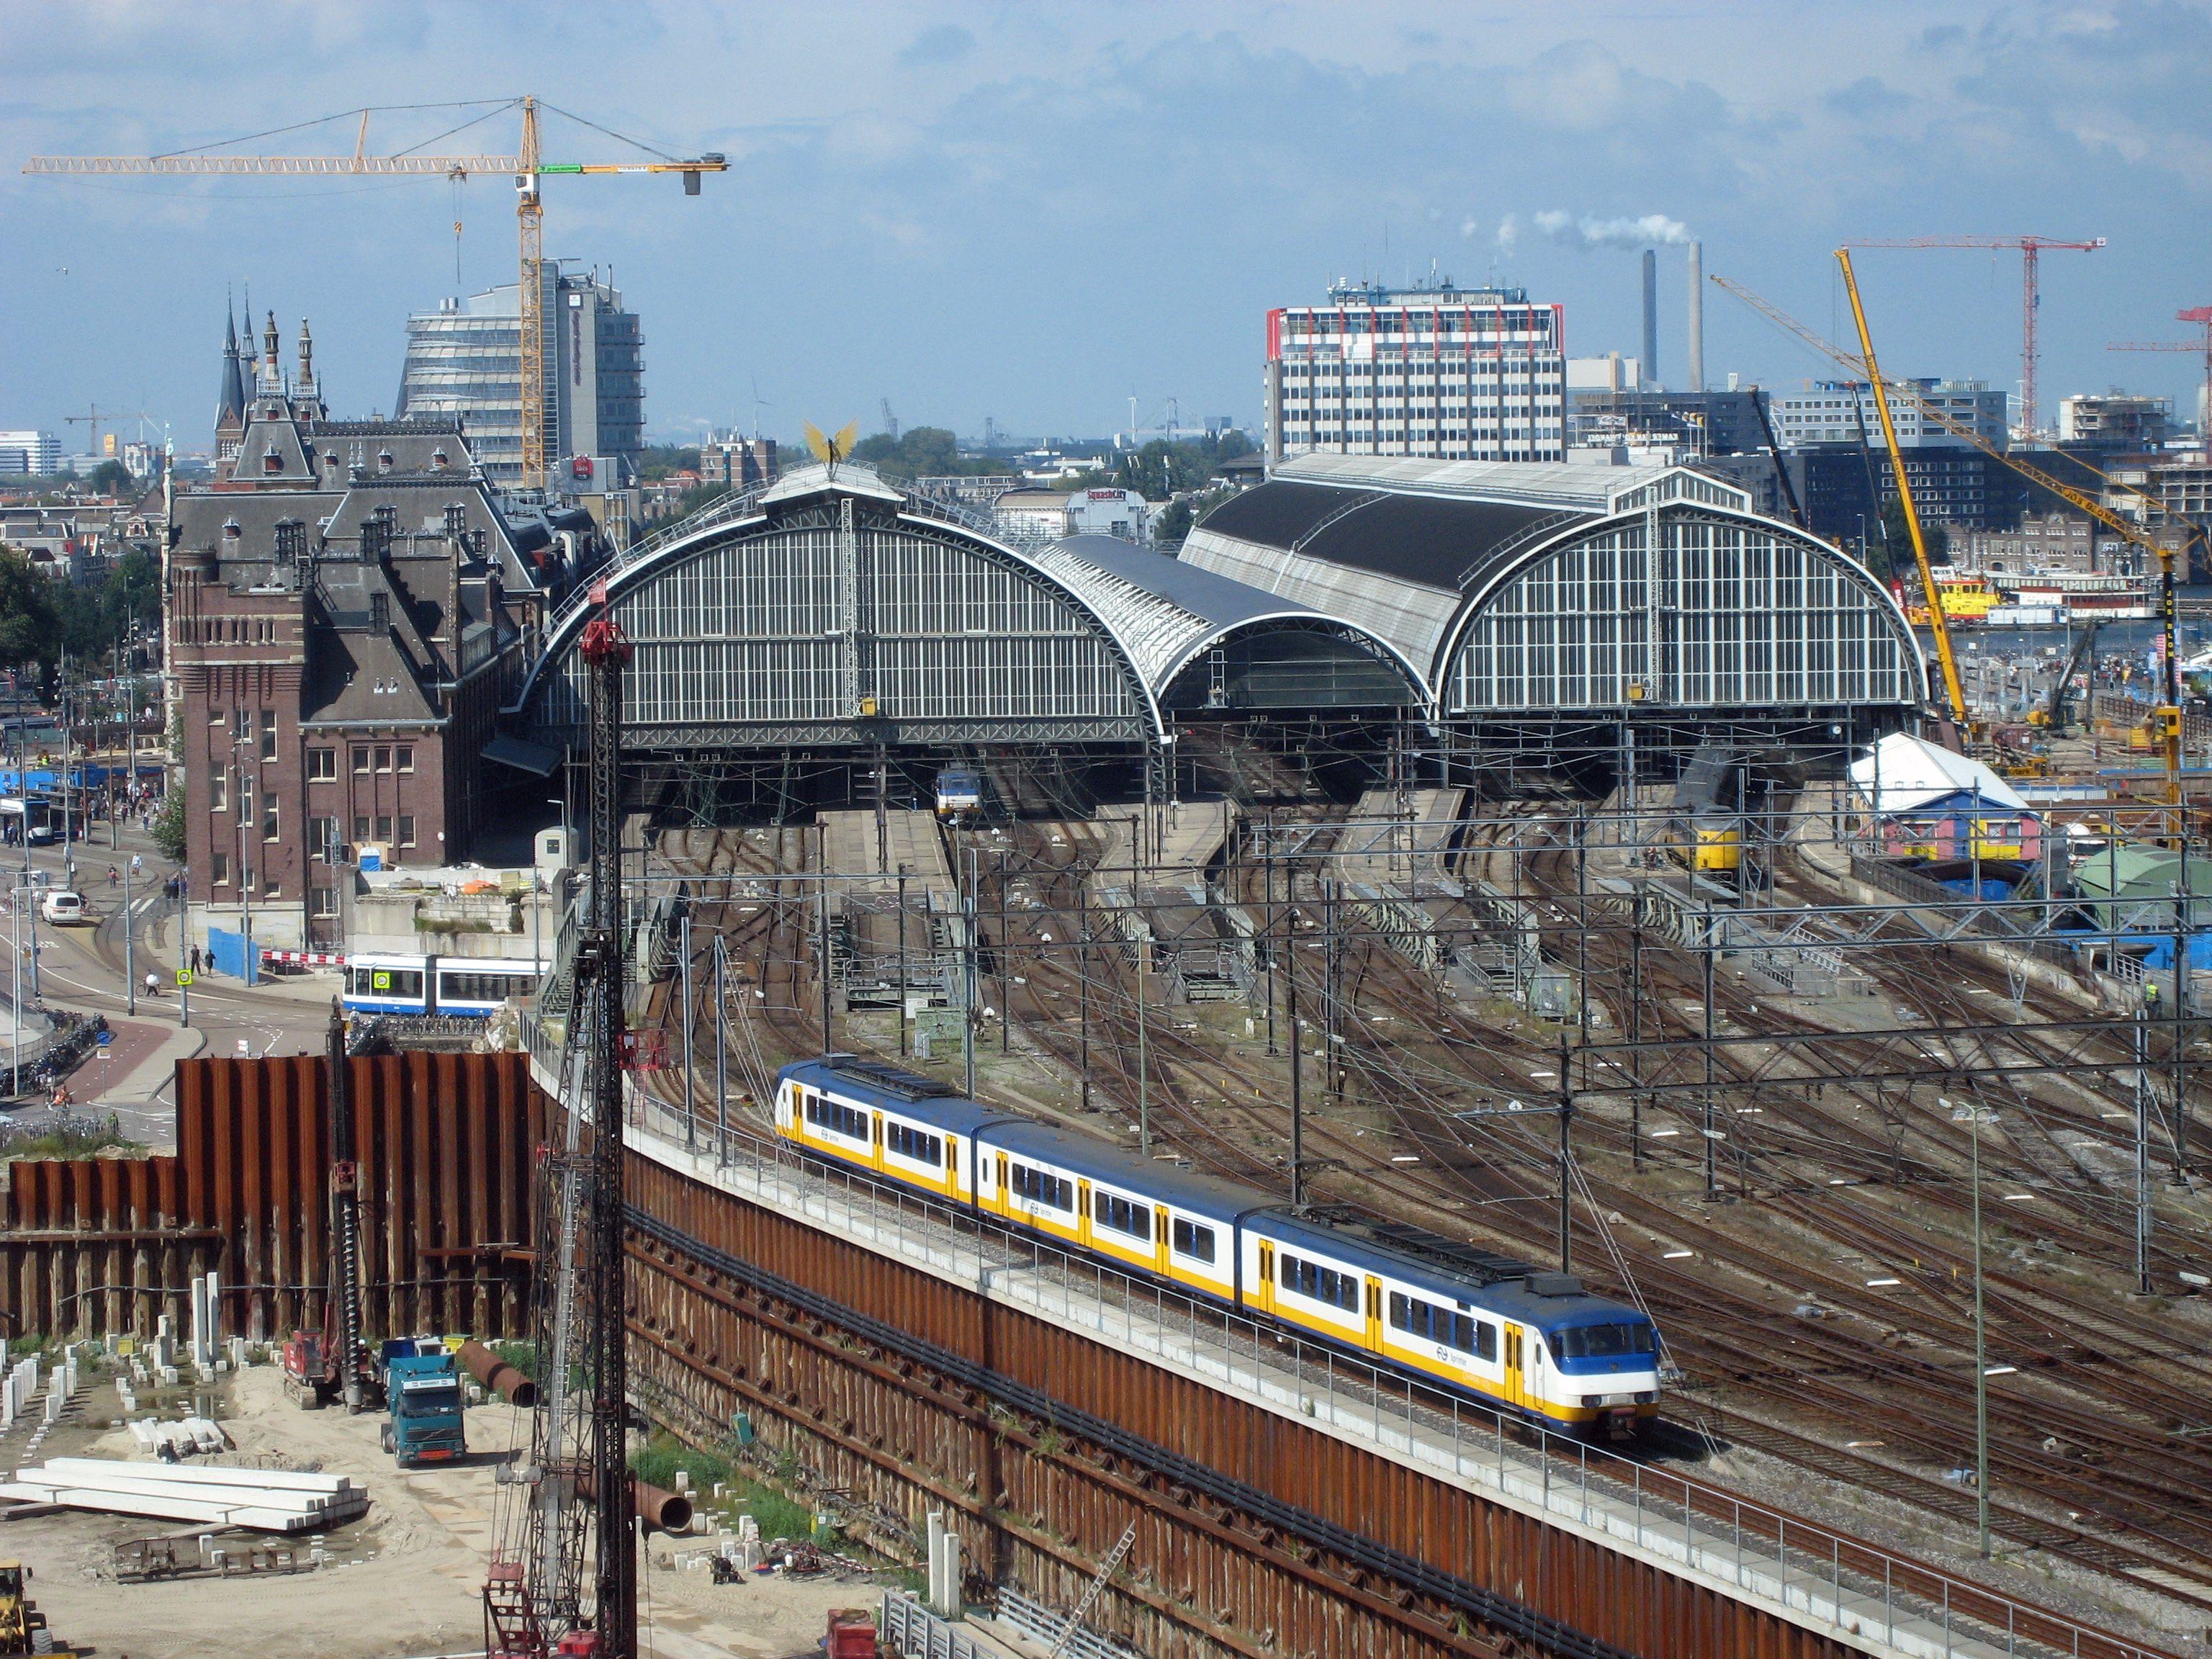 amsterdam centraal station - Google zoeken